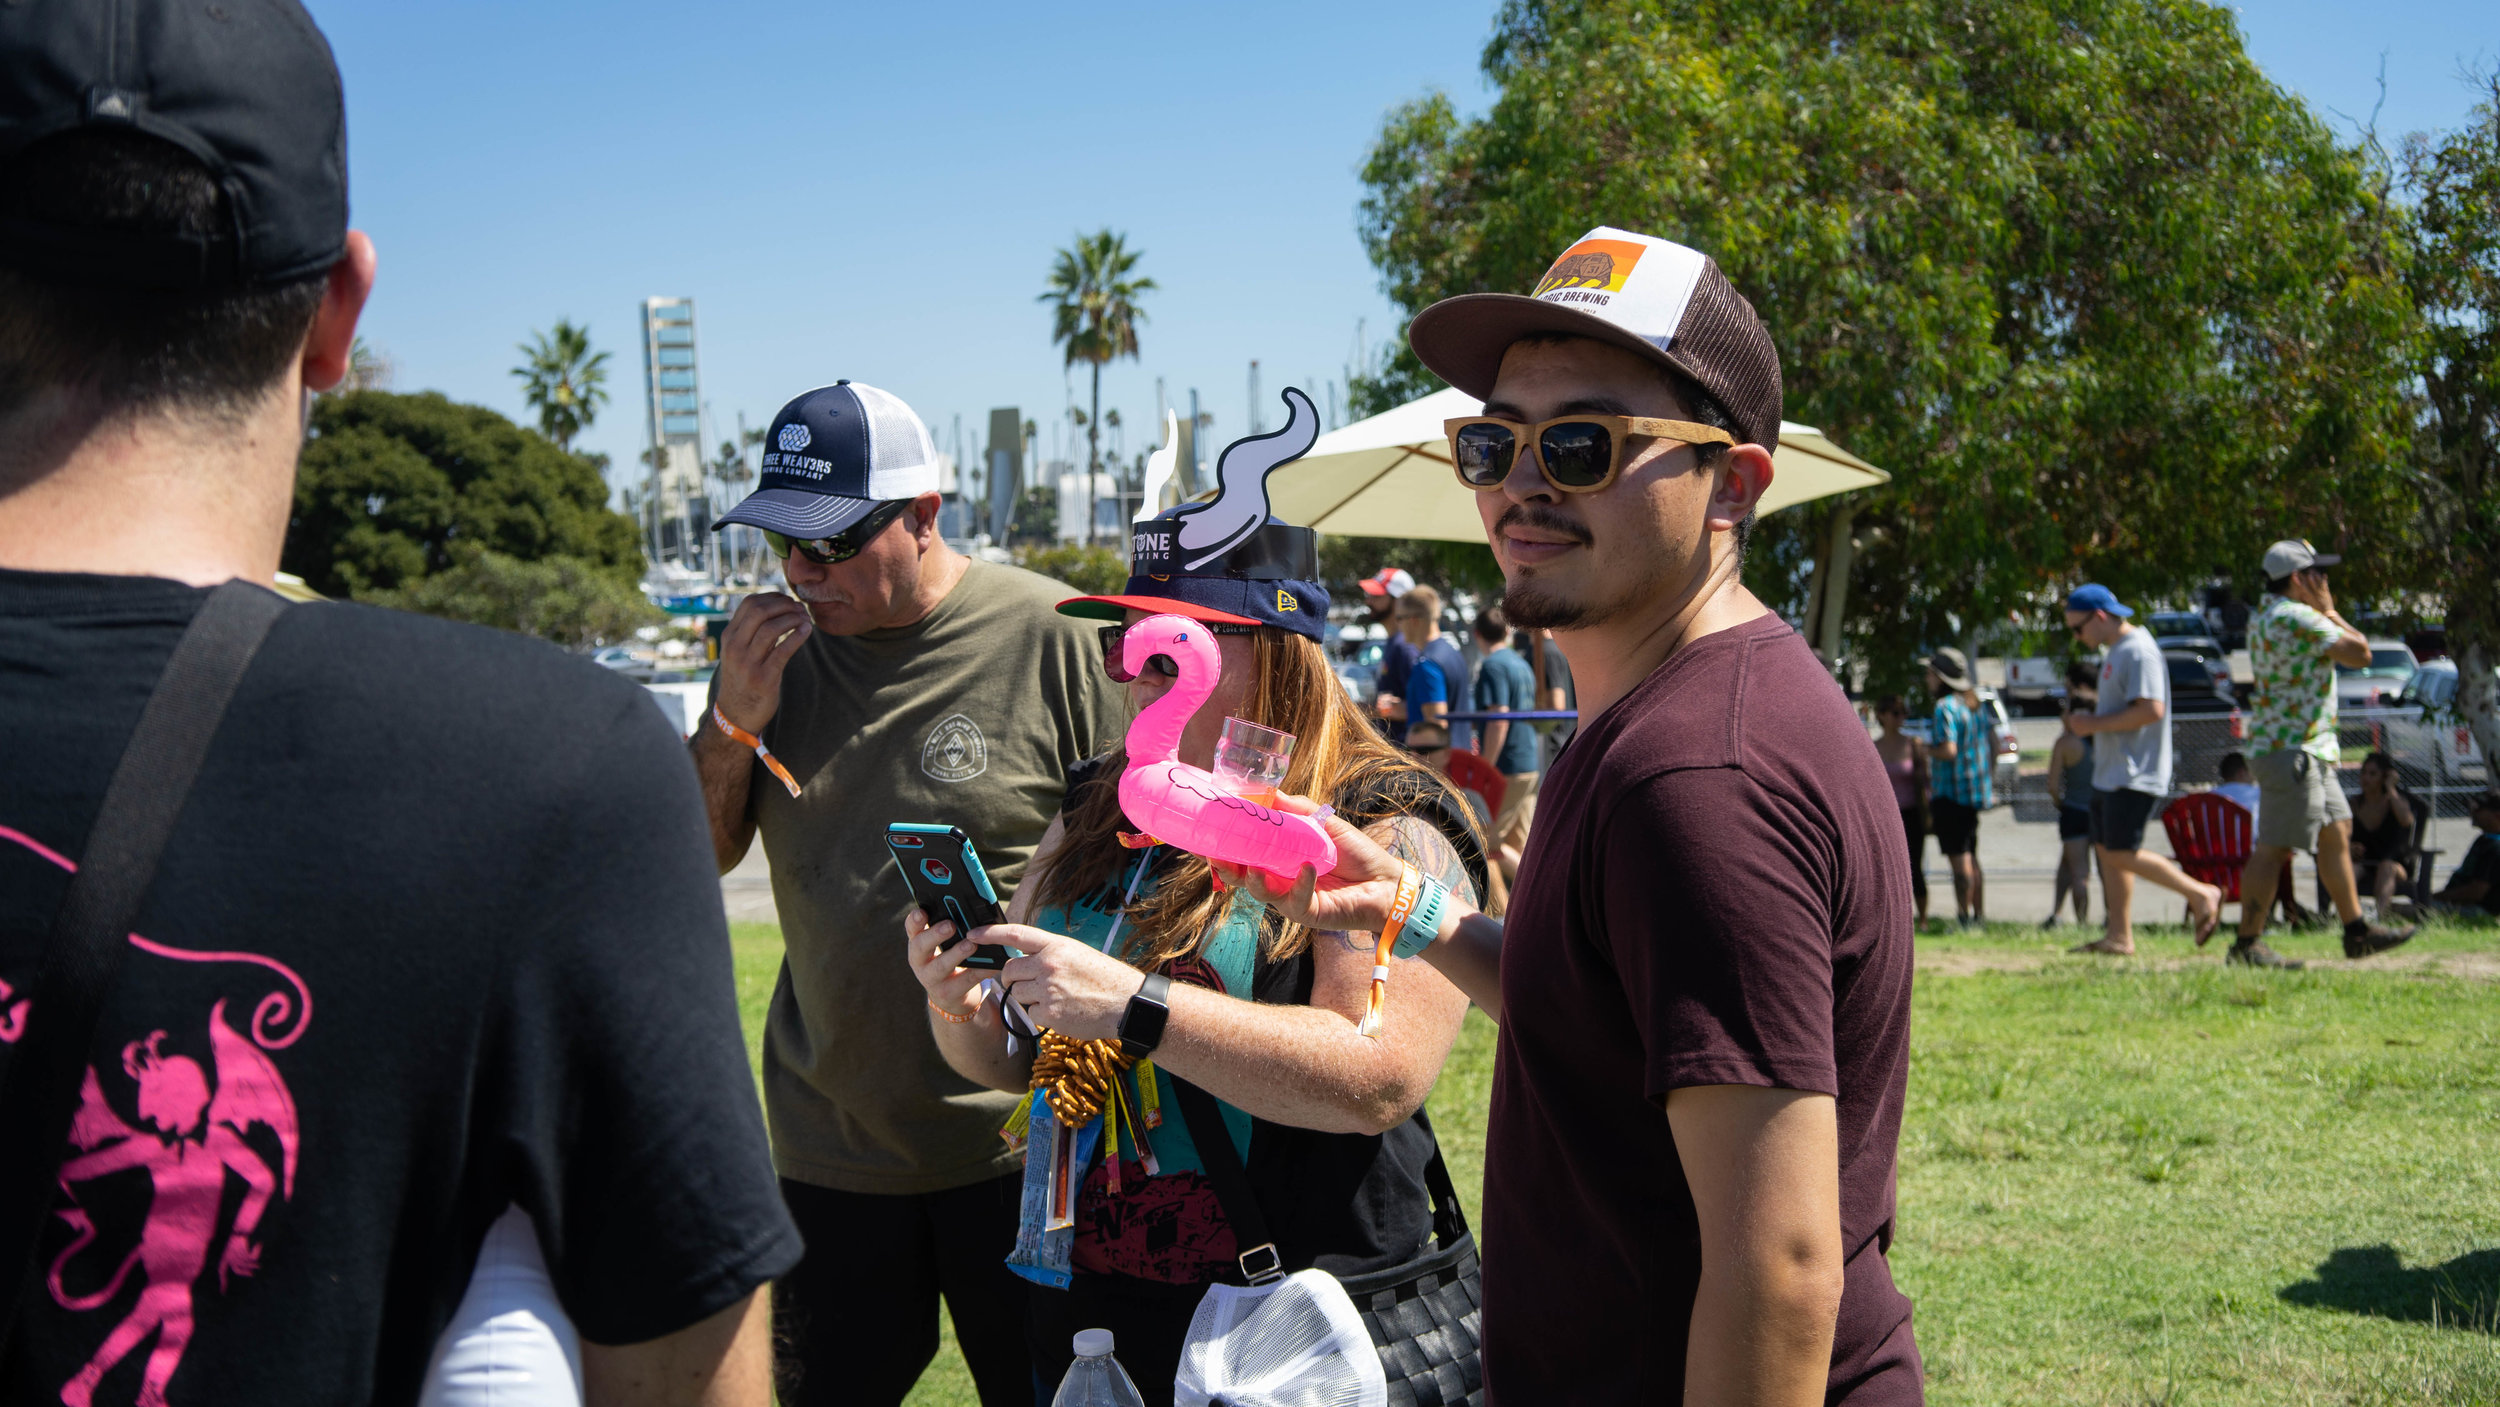 The festival was centered around fun, and everyone present had a pretty good sense of humor.